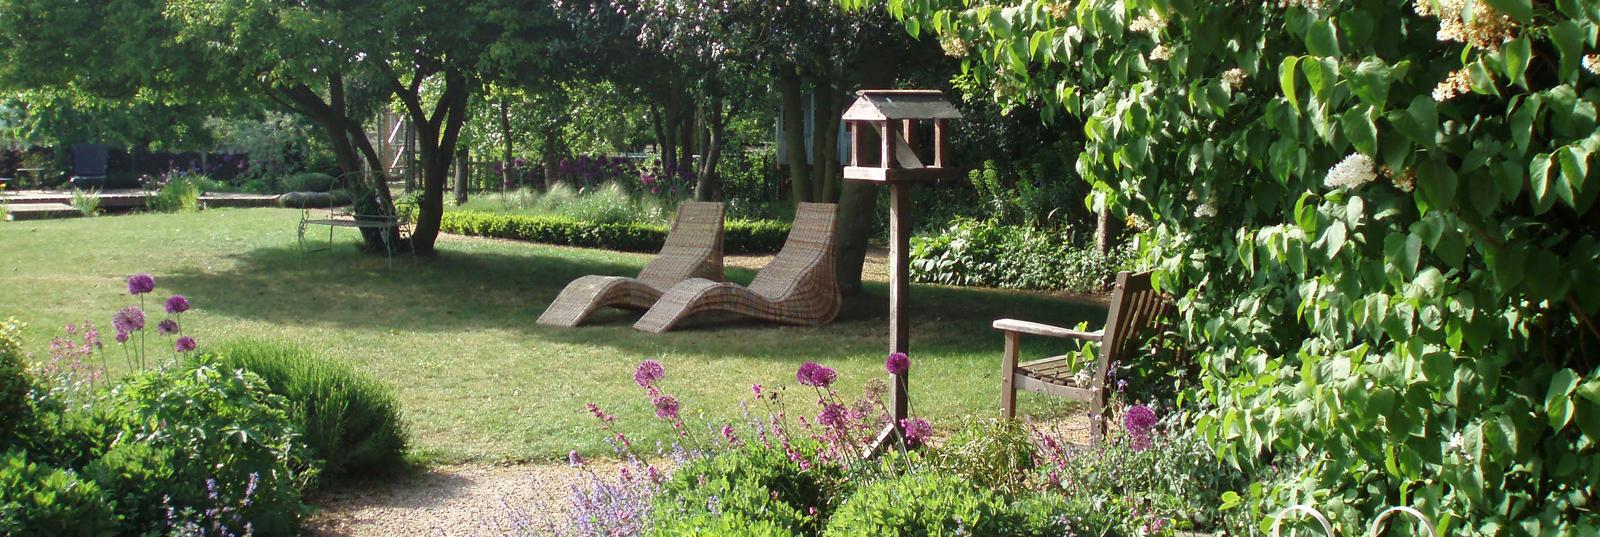 Garden Design Surrey Joanne Winn Garden Landscaping